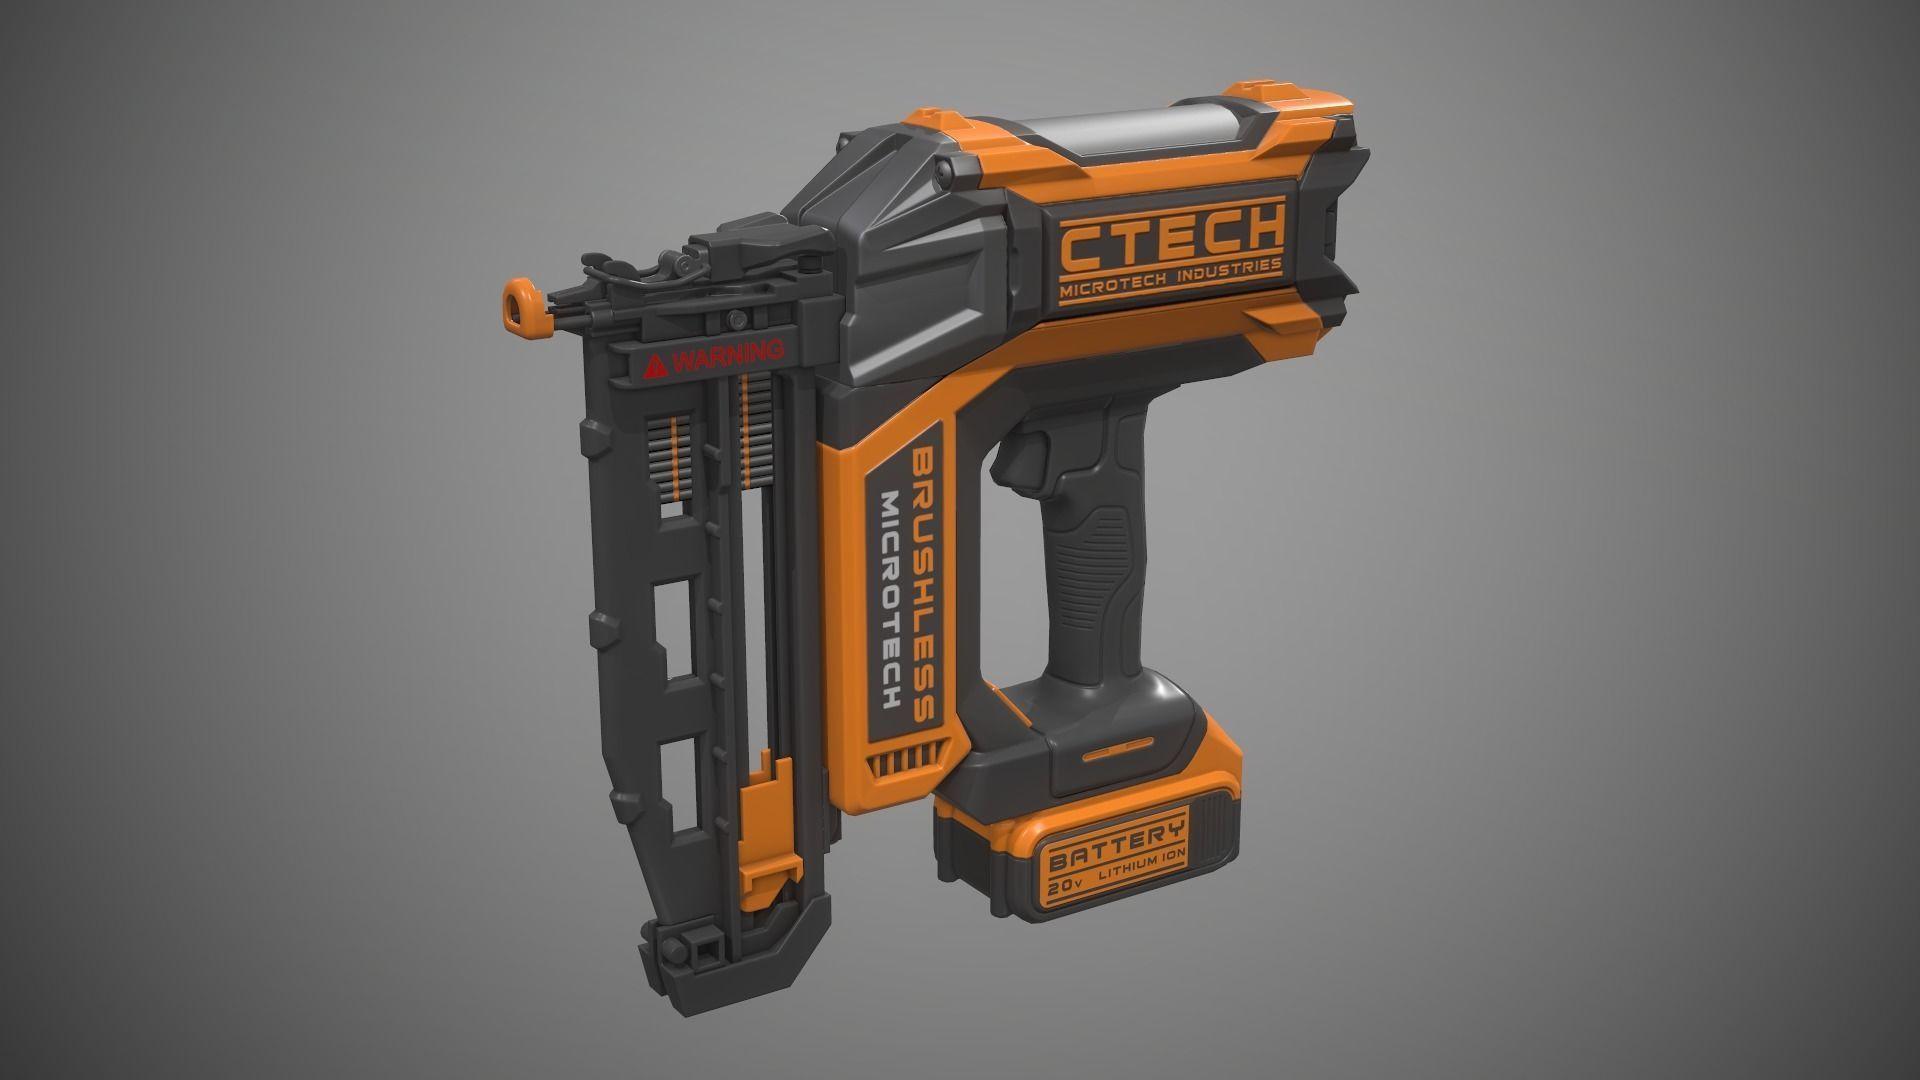 Nail Gun Battery Powered